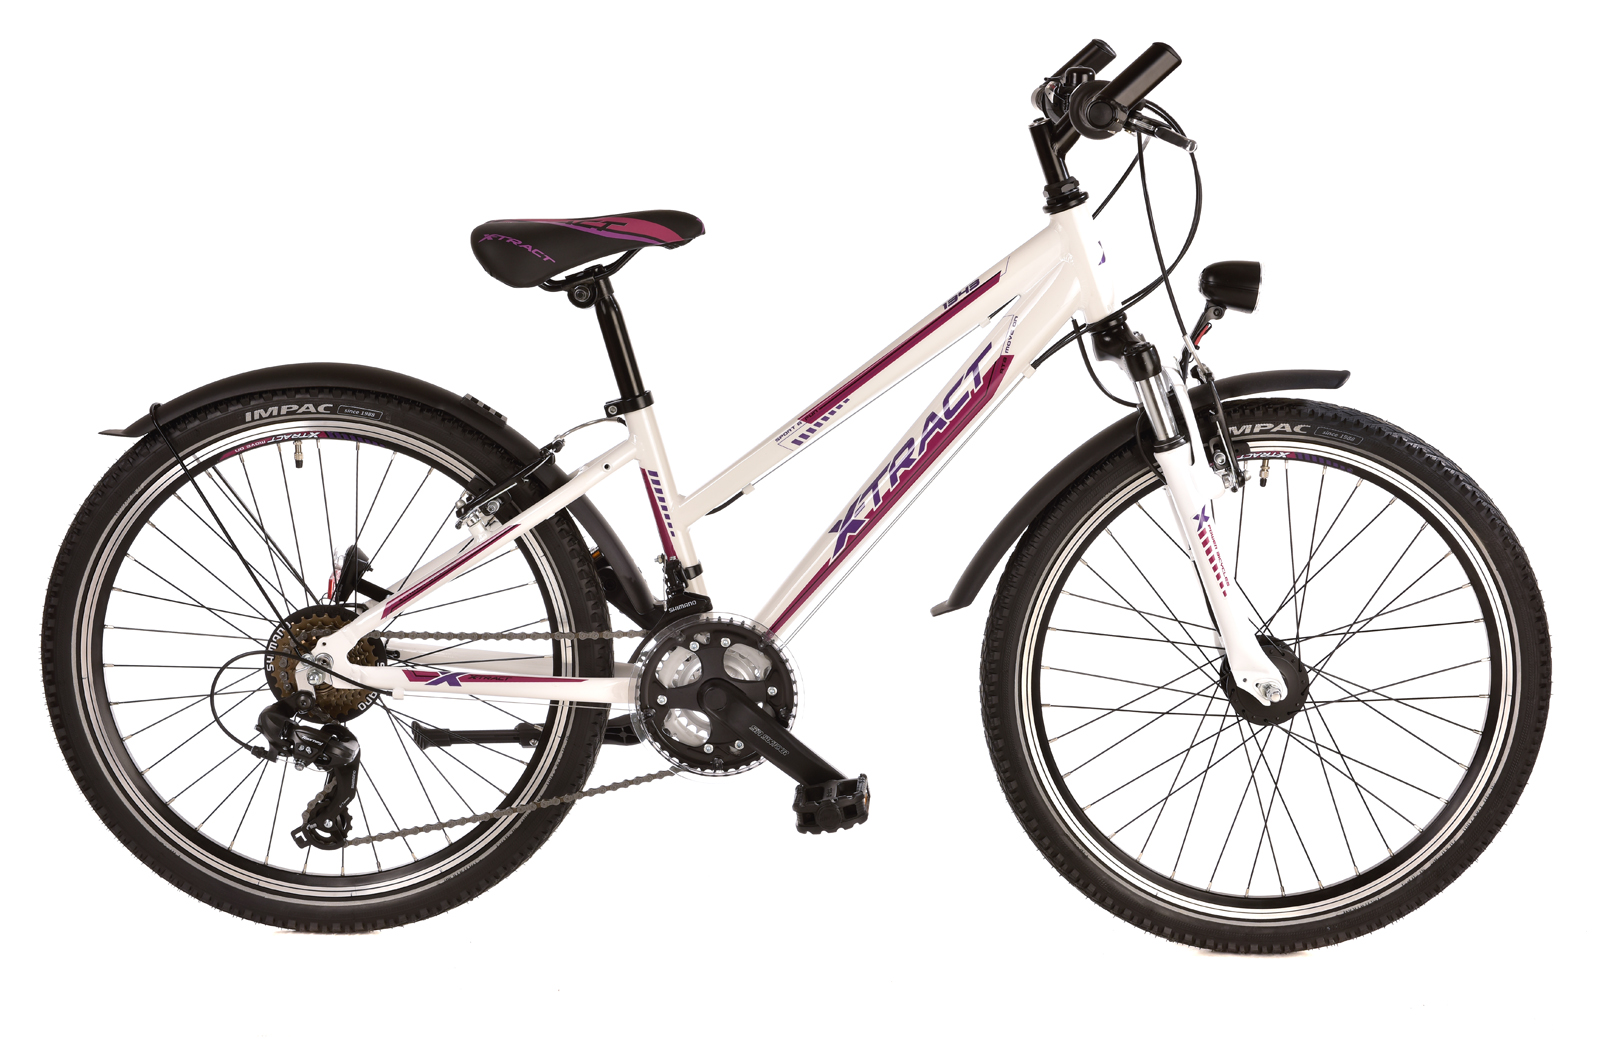 X Tract 1343 Weiss Feldmeier Bikes